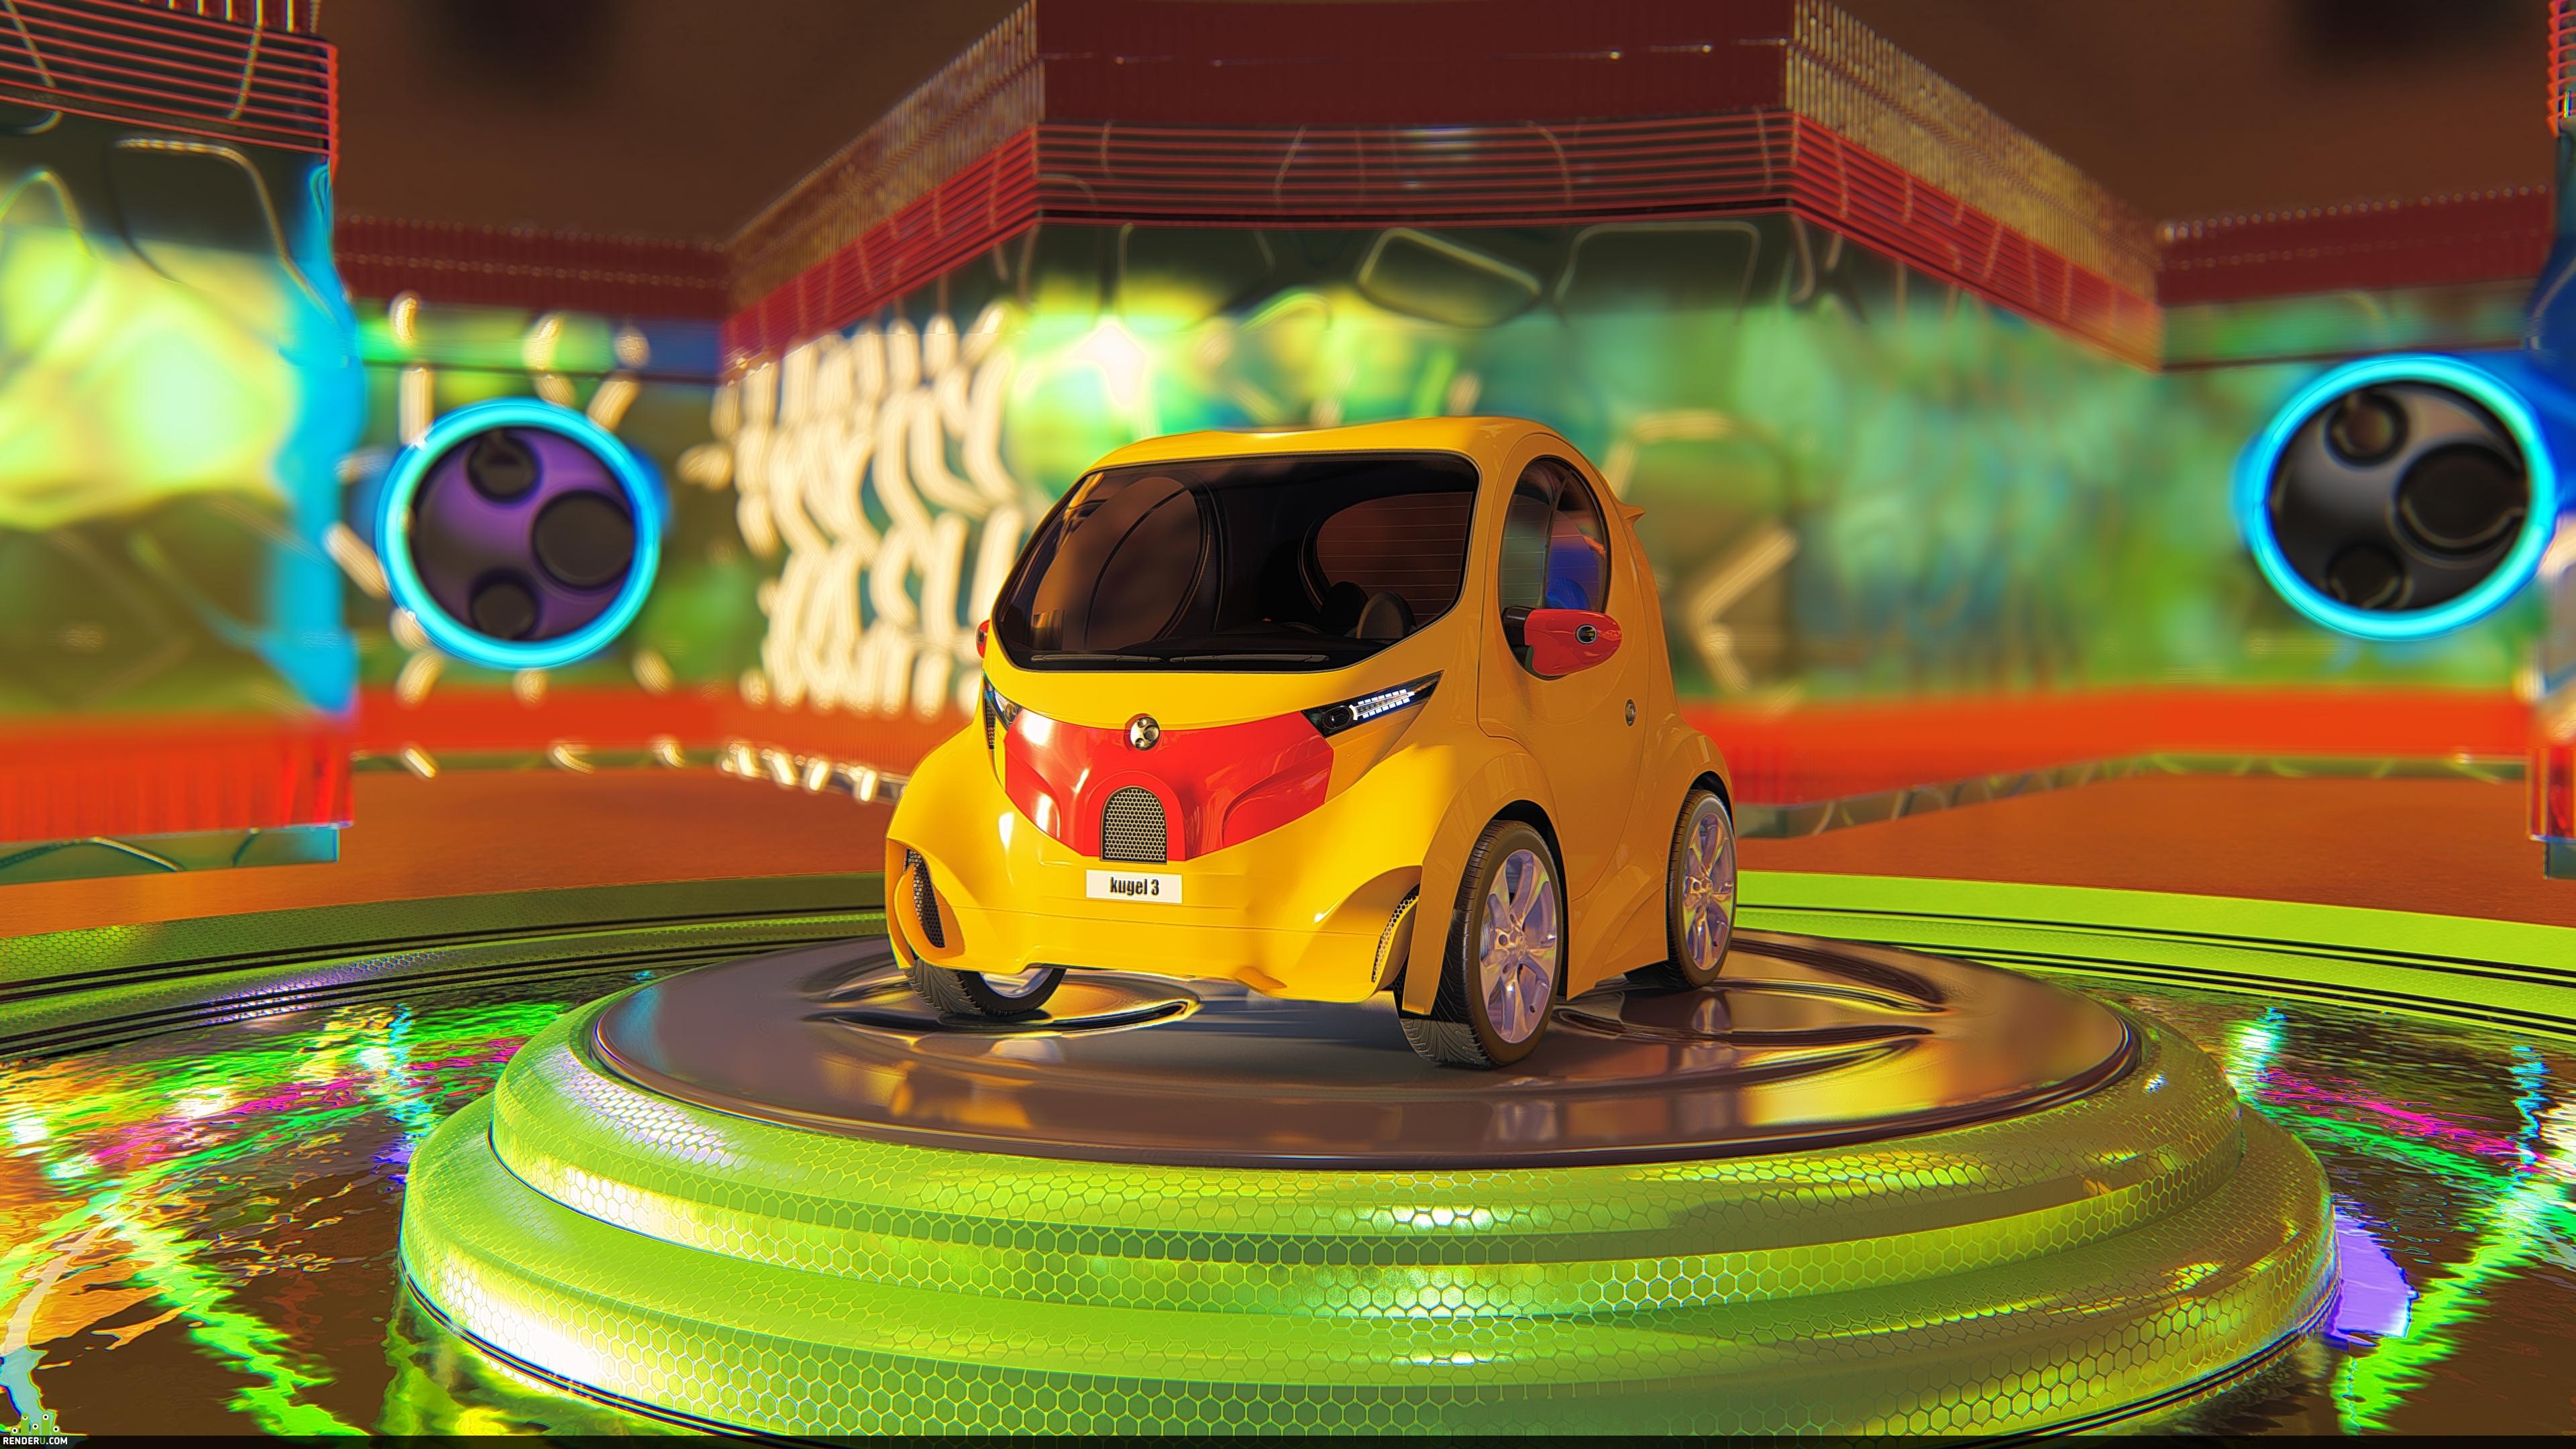 preview Kugel Electric Car Design / Дизайн Электро Автомобиль